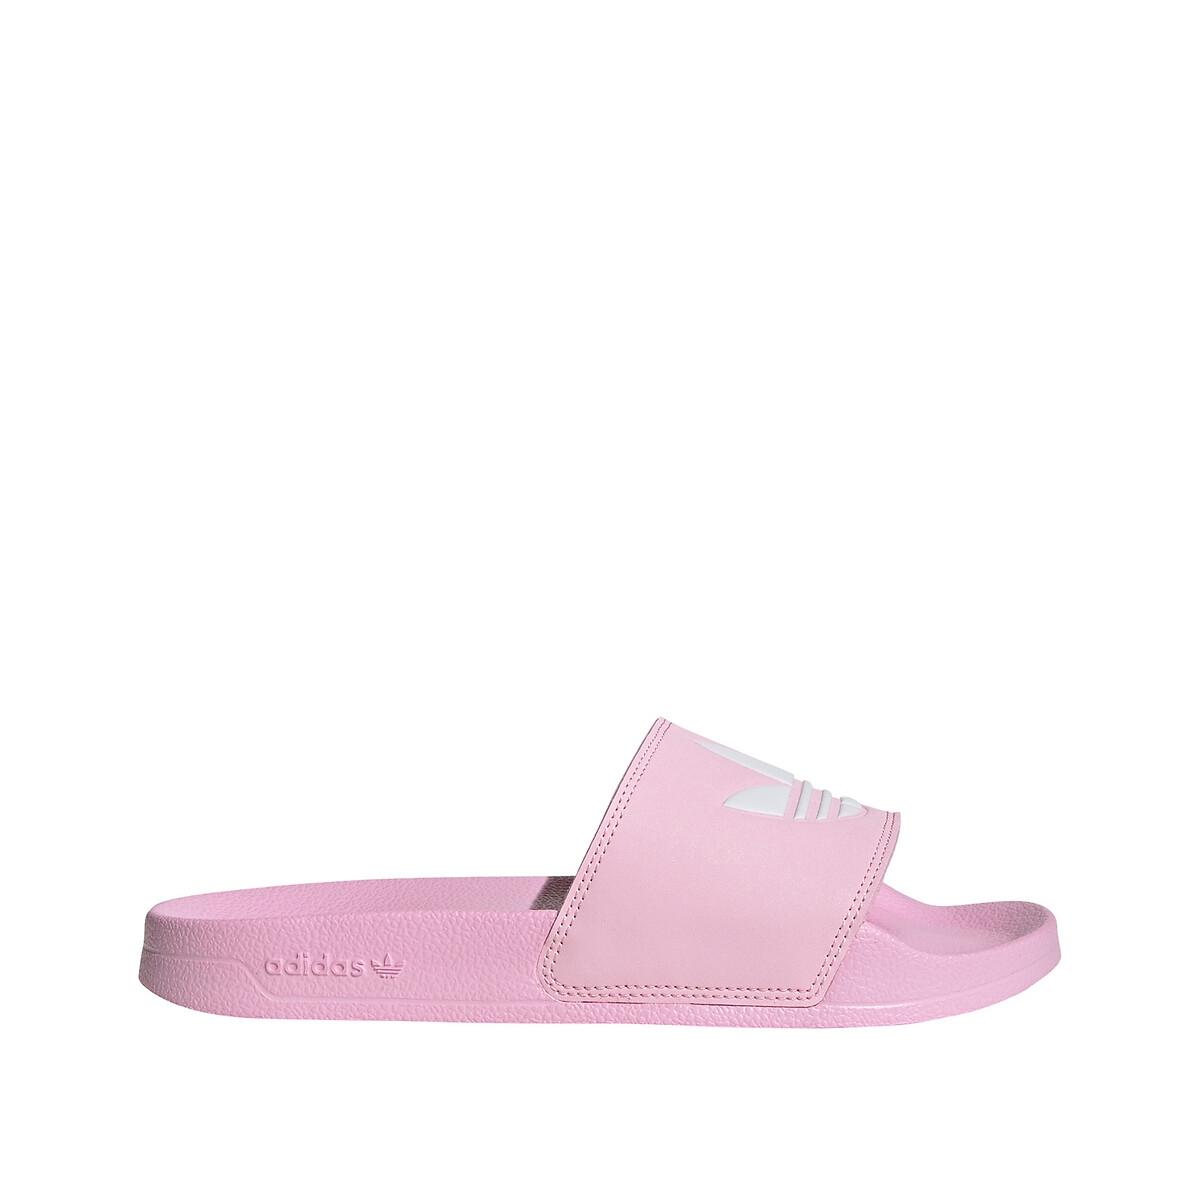 Adidas Originals Adilette Lite badslippers roze/wit online kopen